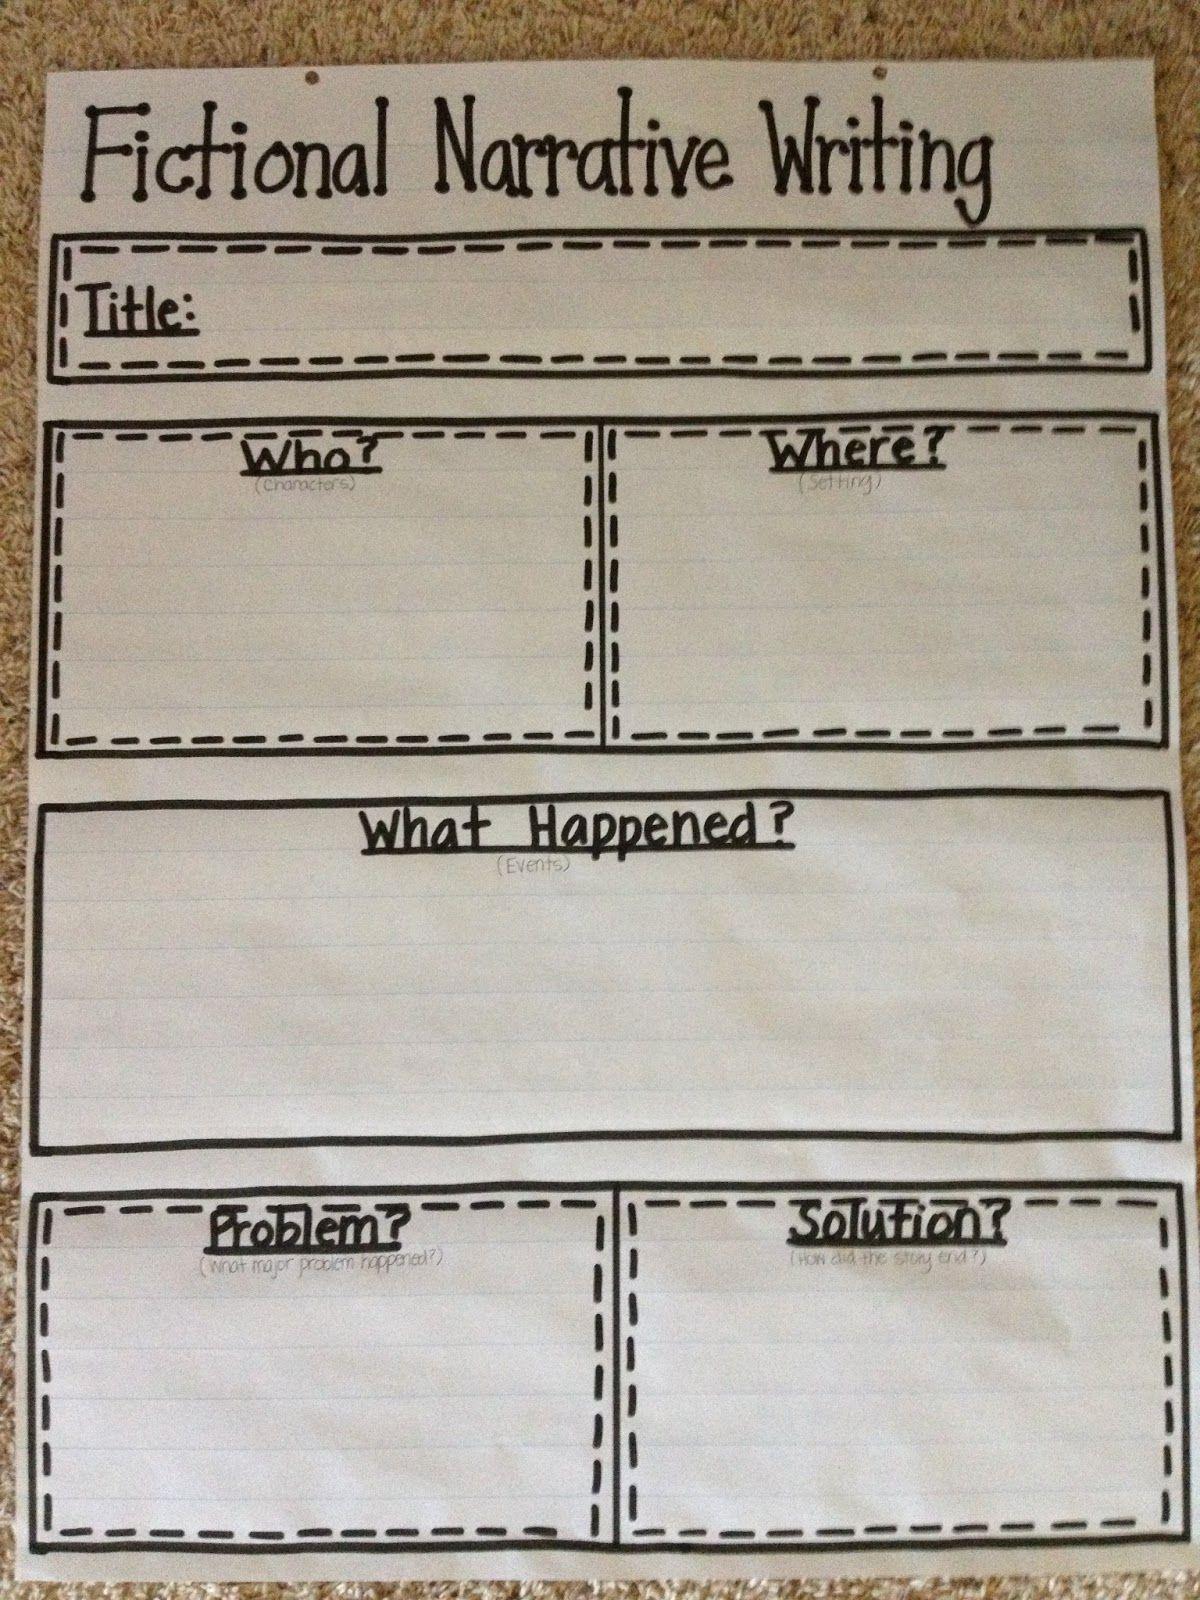 Fictional Narrative Writing Frame: Mrs. Terhune  Narrative